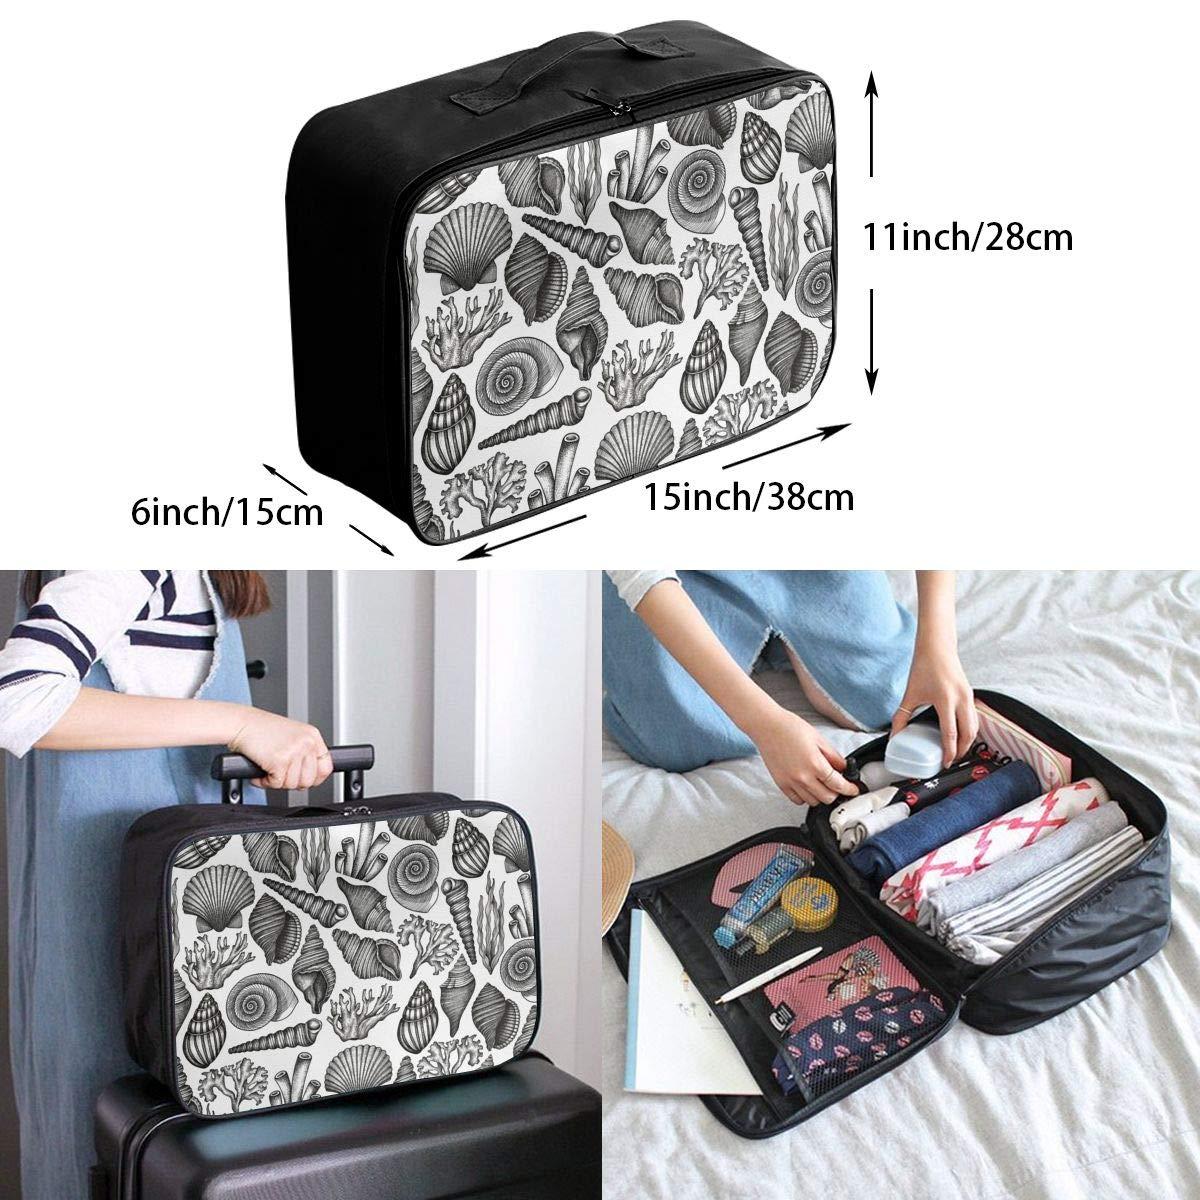 Travel Luggage Duffle Bag Lightweight Portable Handbag Shell Print Large Capacity Waterproof Foldable Storage Tote